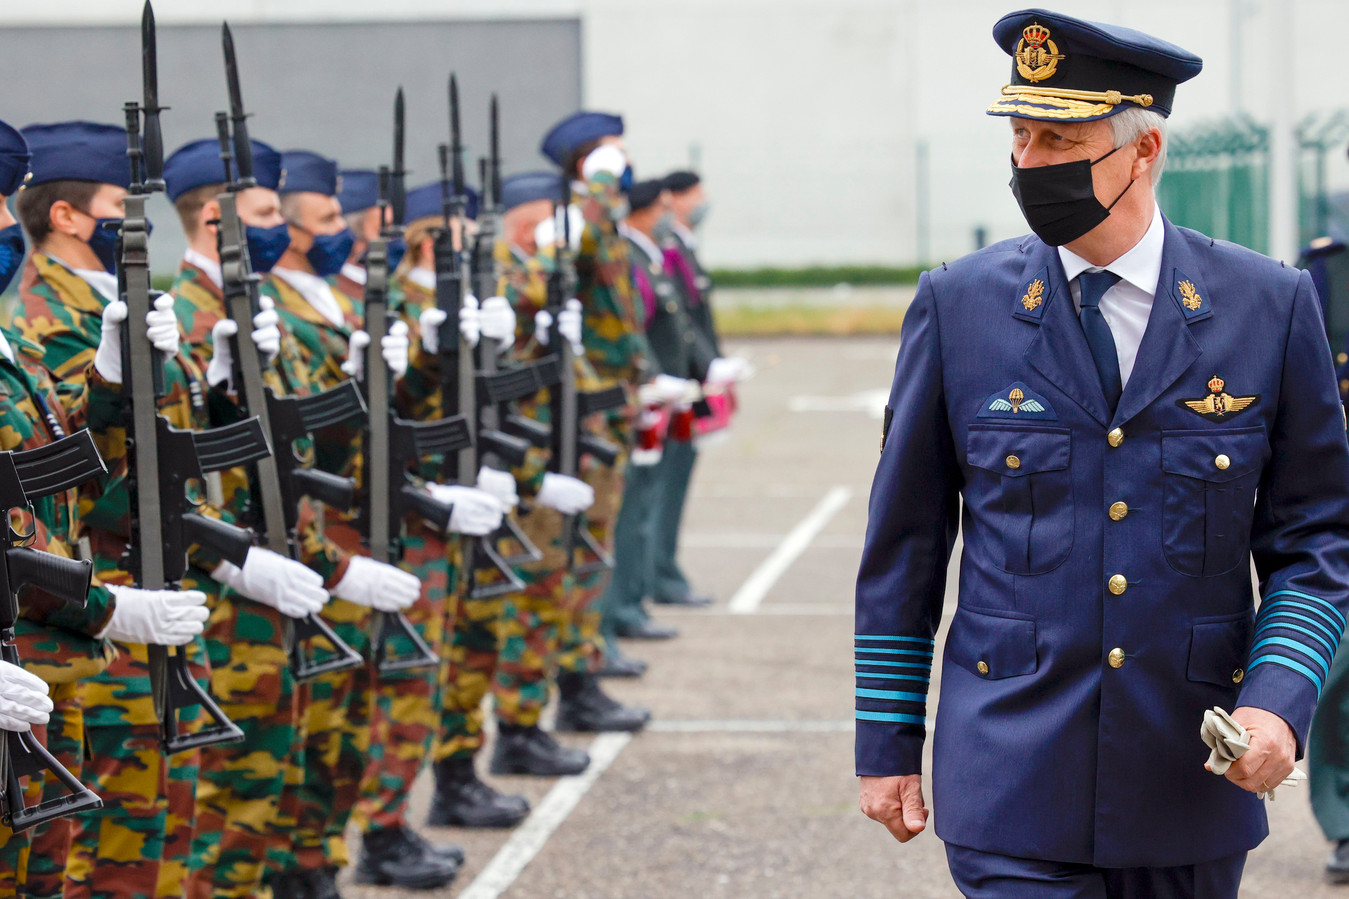 Koning Filip op de militaire luchthaven in Melsbroek.